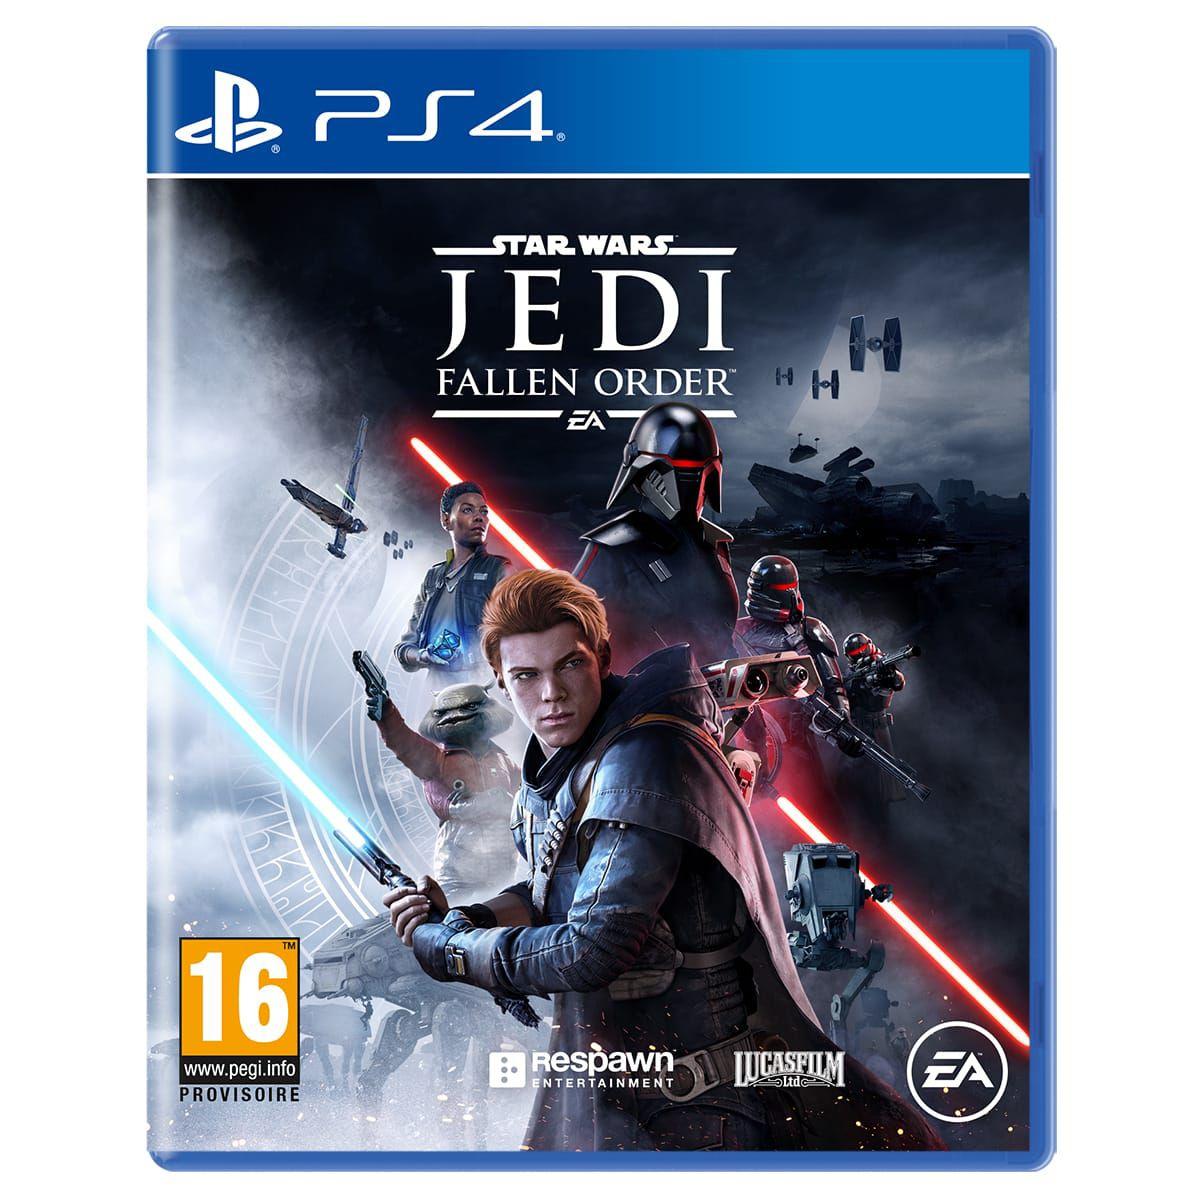 [Précommande] Star Wars Jedi Fallen Order sur PS4